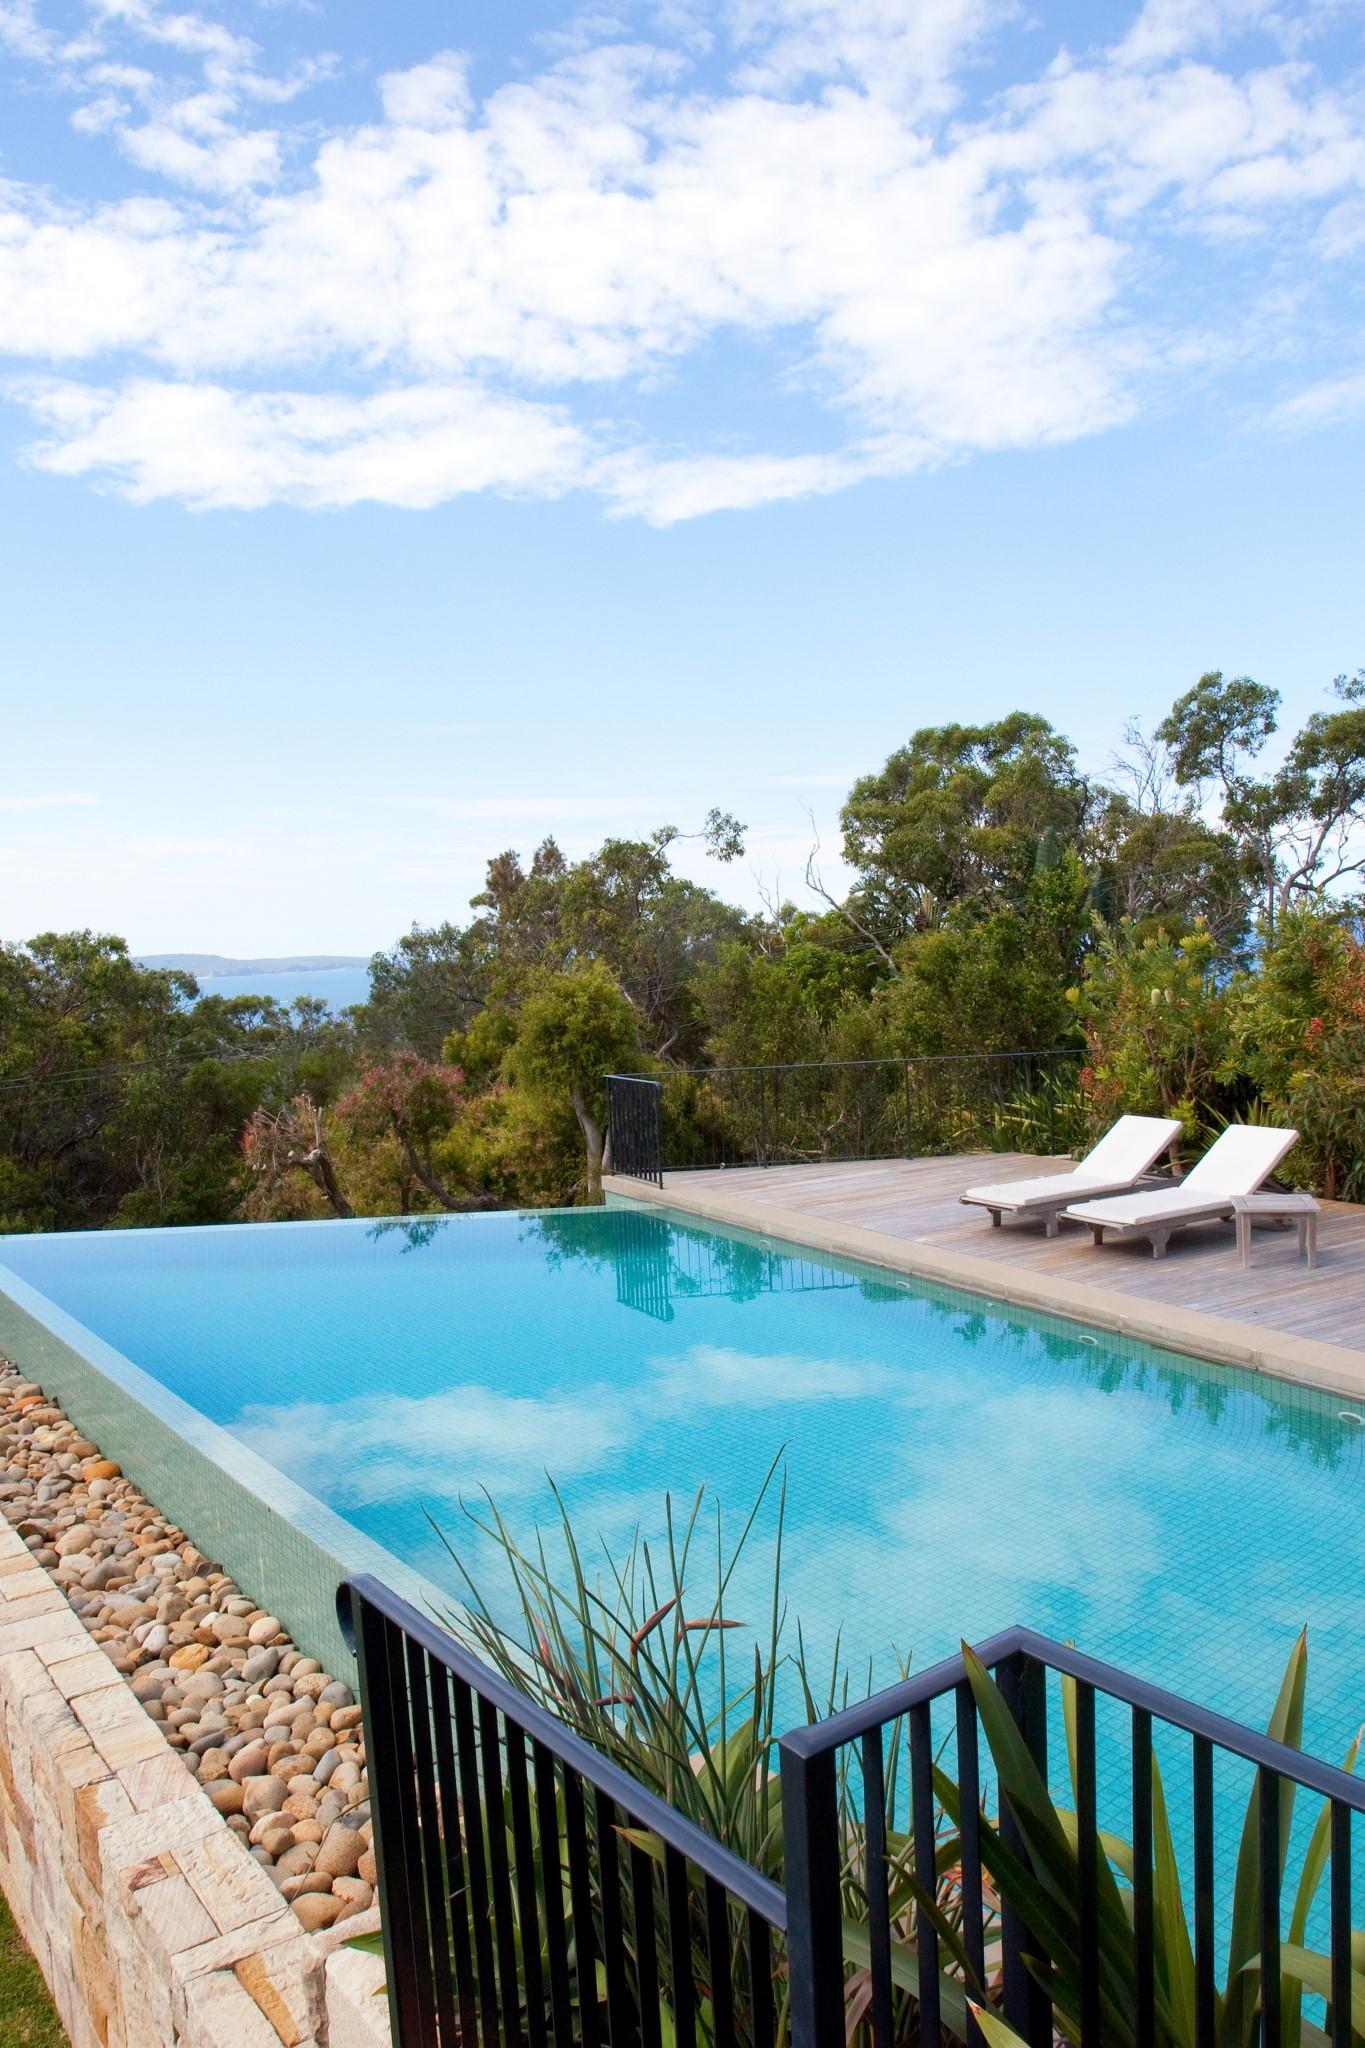 Infinity Swimming Pool of Premier Pools